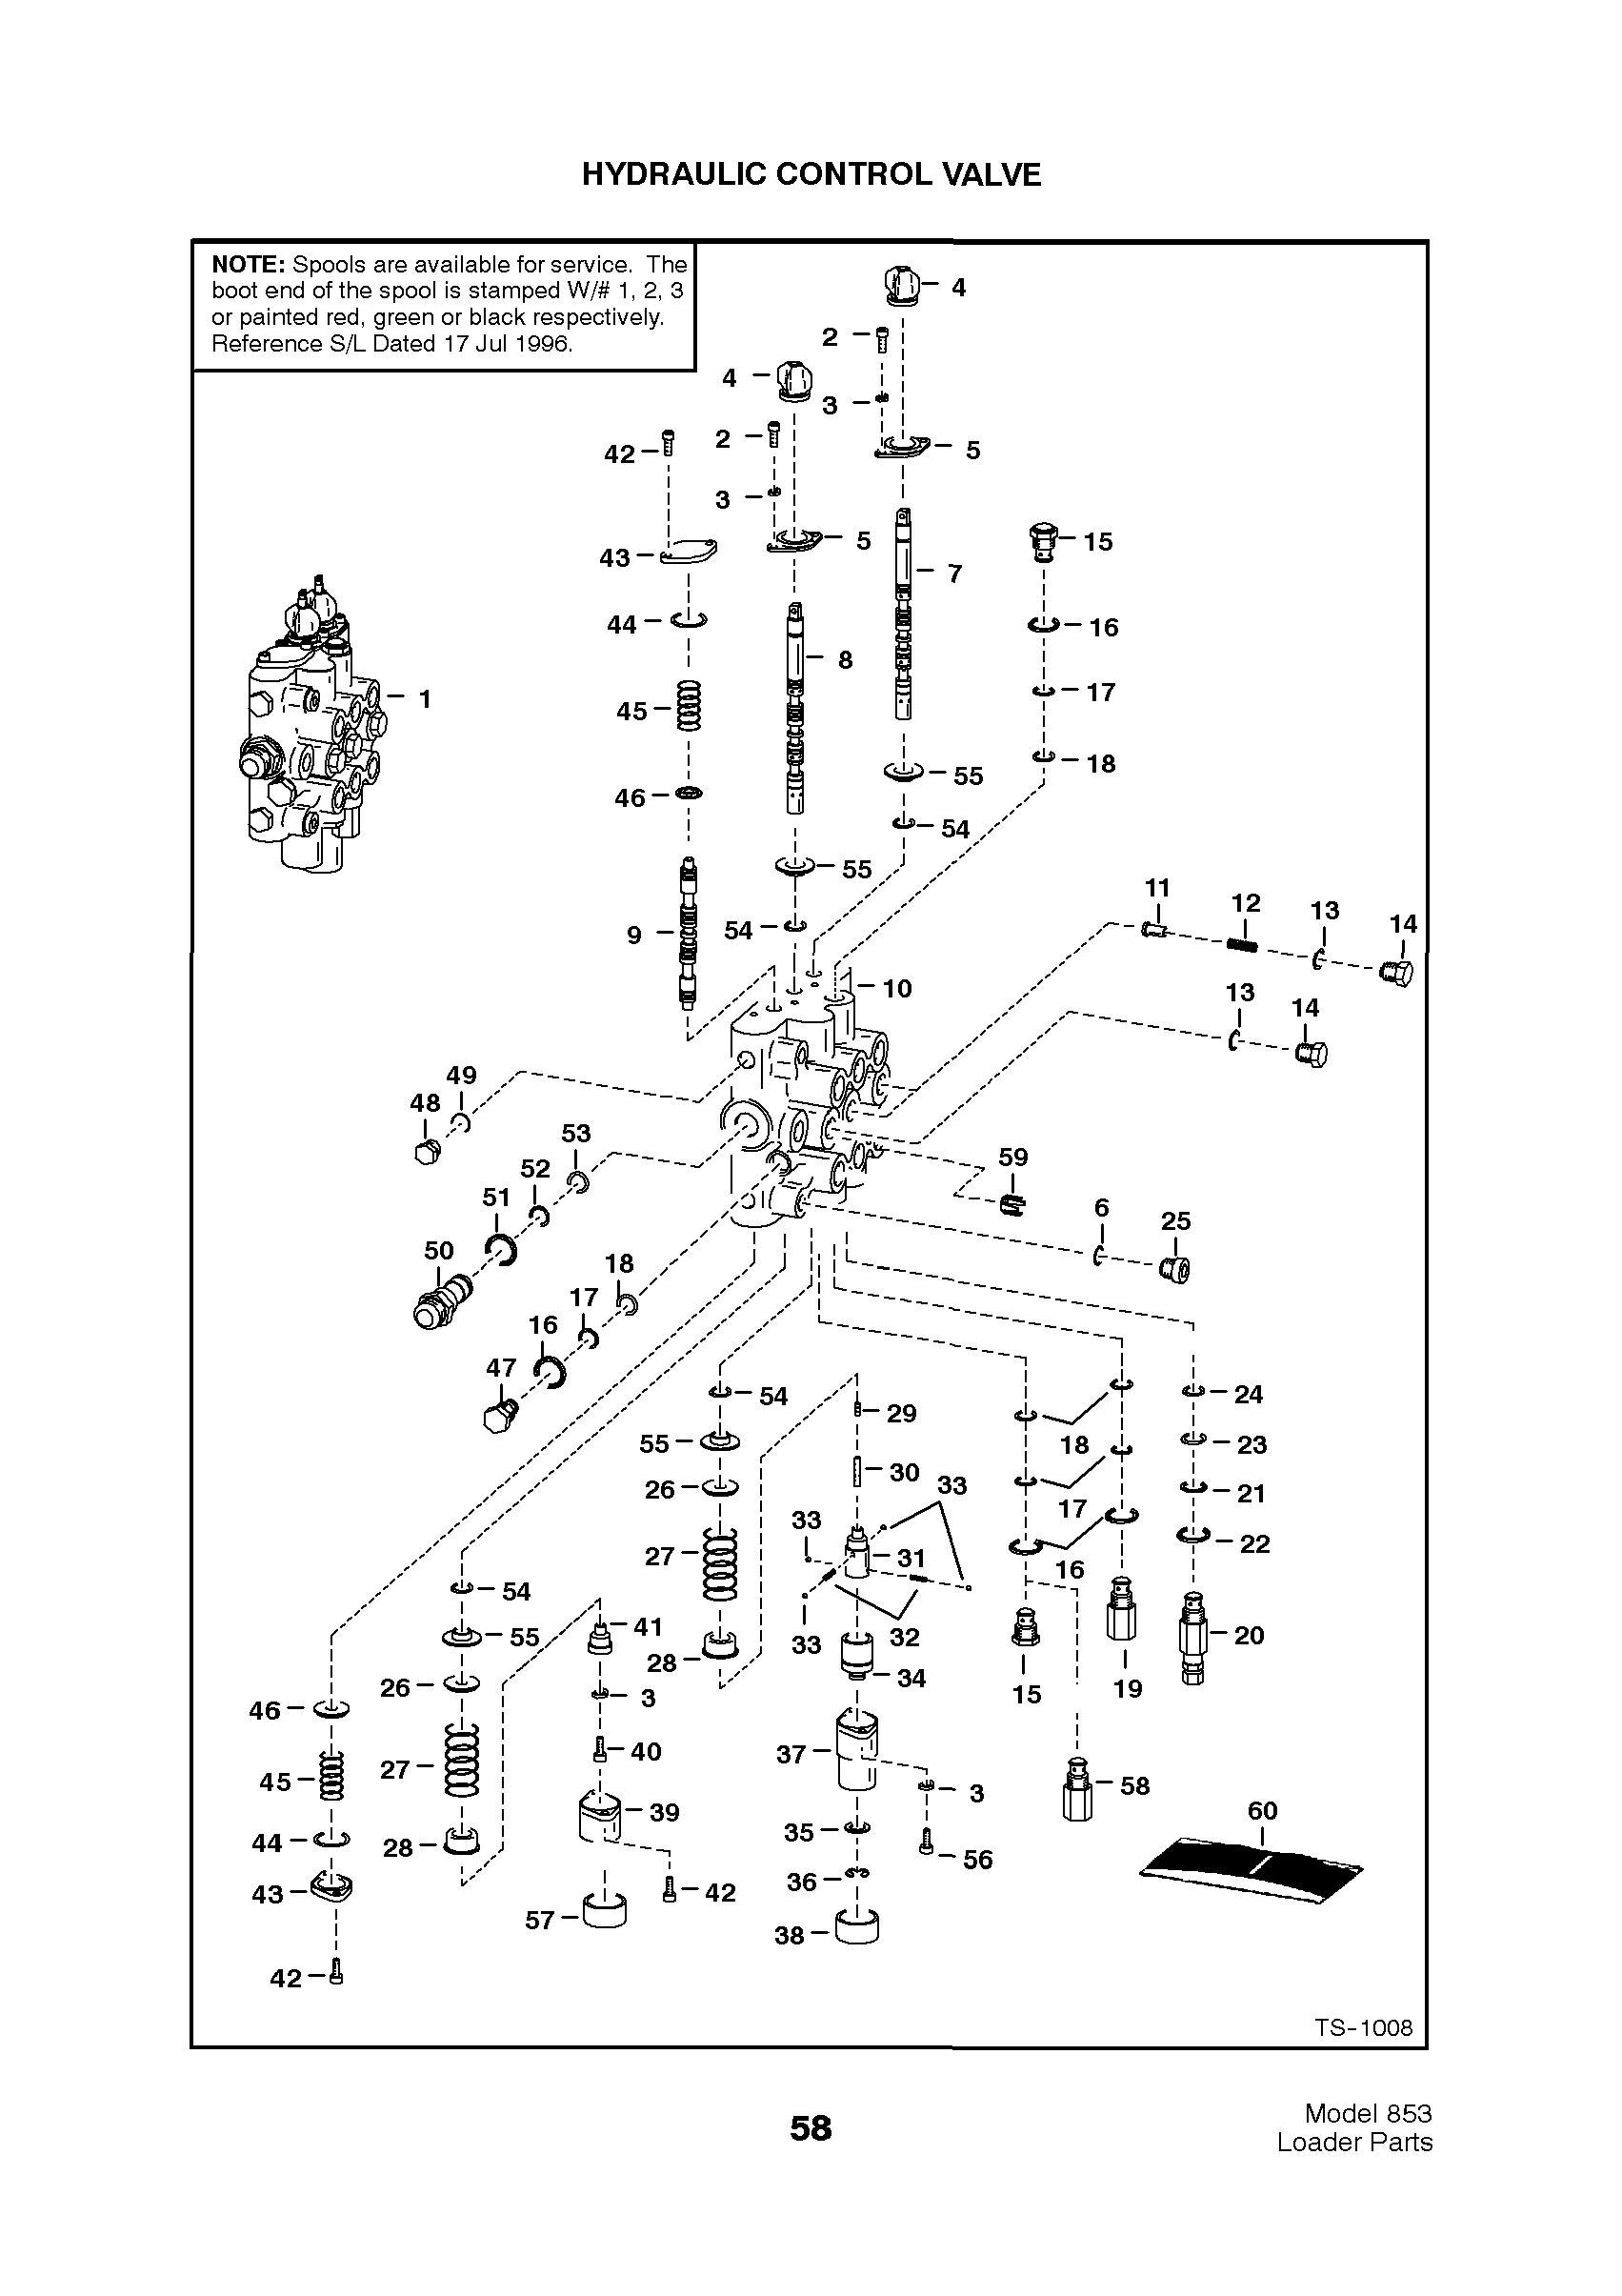 [NG_0711] Bobcat Control Valve Diagram Schematic Wiring